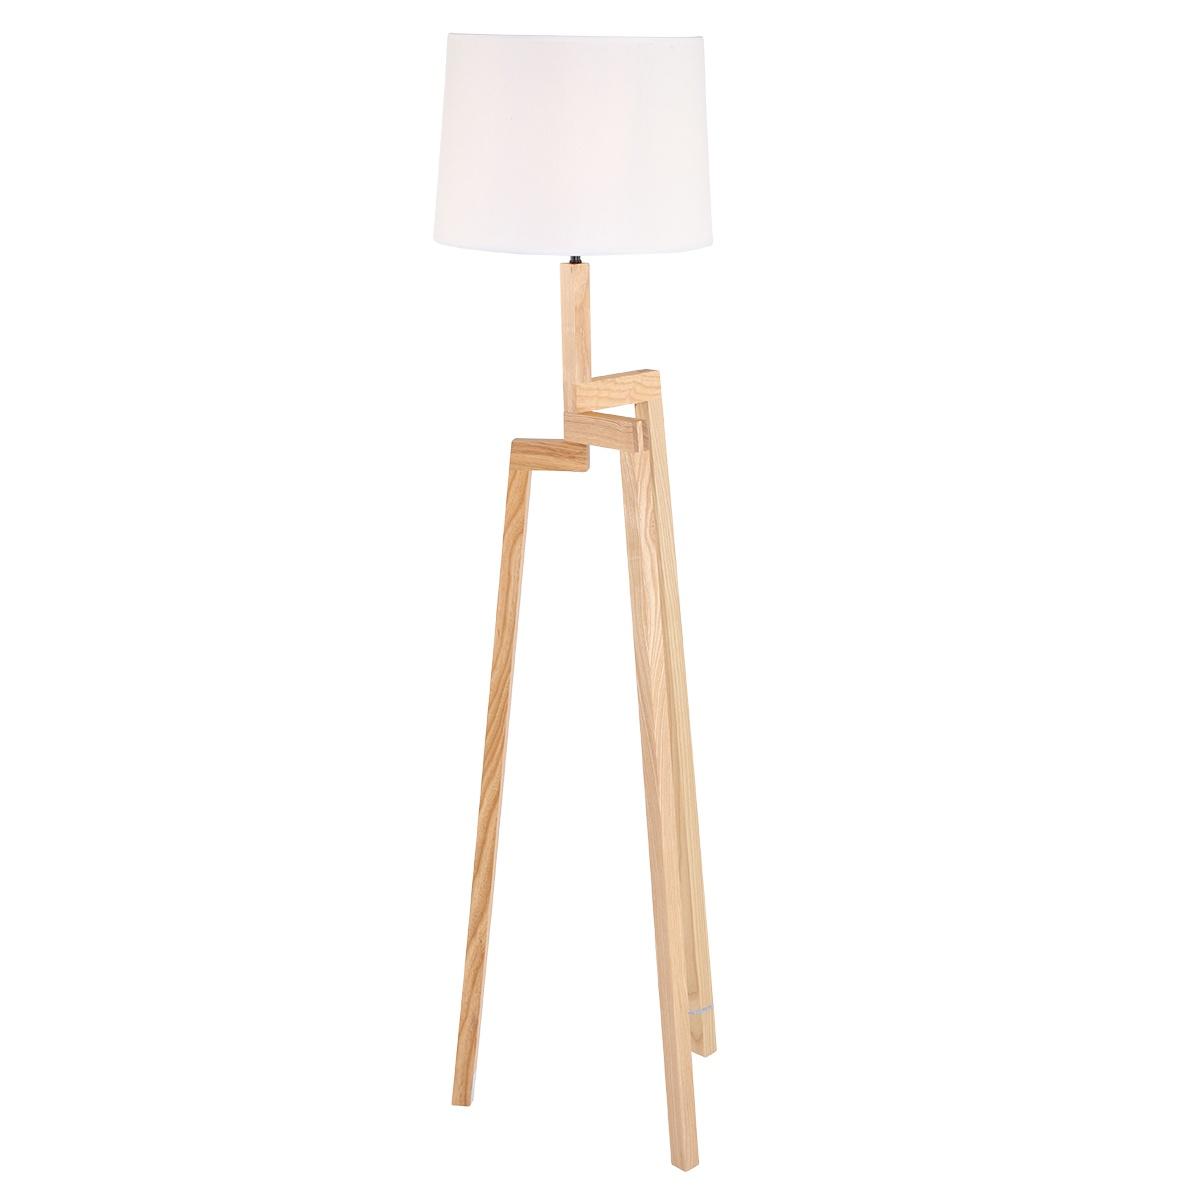 Vloerlamp 1-lichts 3-poot -doos A+B- MEXLITE - 7661BE - Vloerlamp- Mexlite- Bess- Modern - Trendy- Wit Bruin Witte kap- houten frame- zwart/wit snoer- Metaal Hout